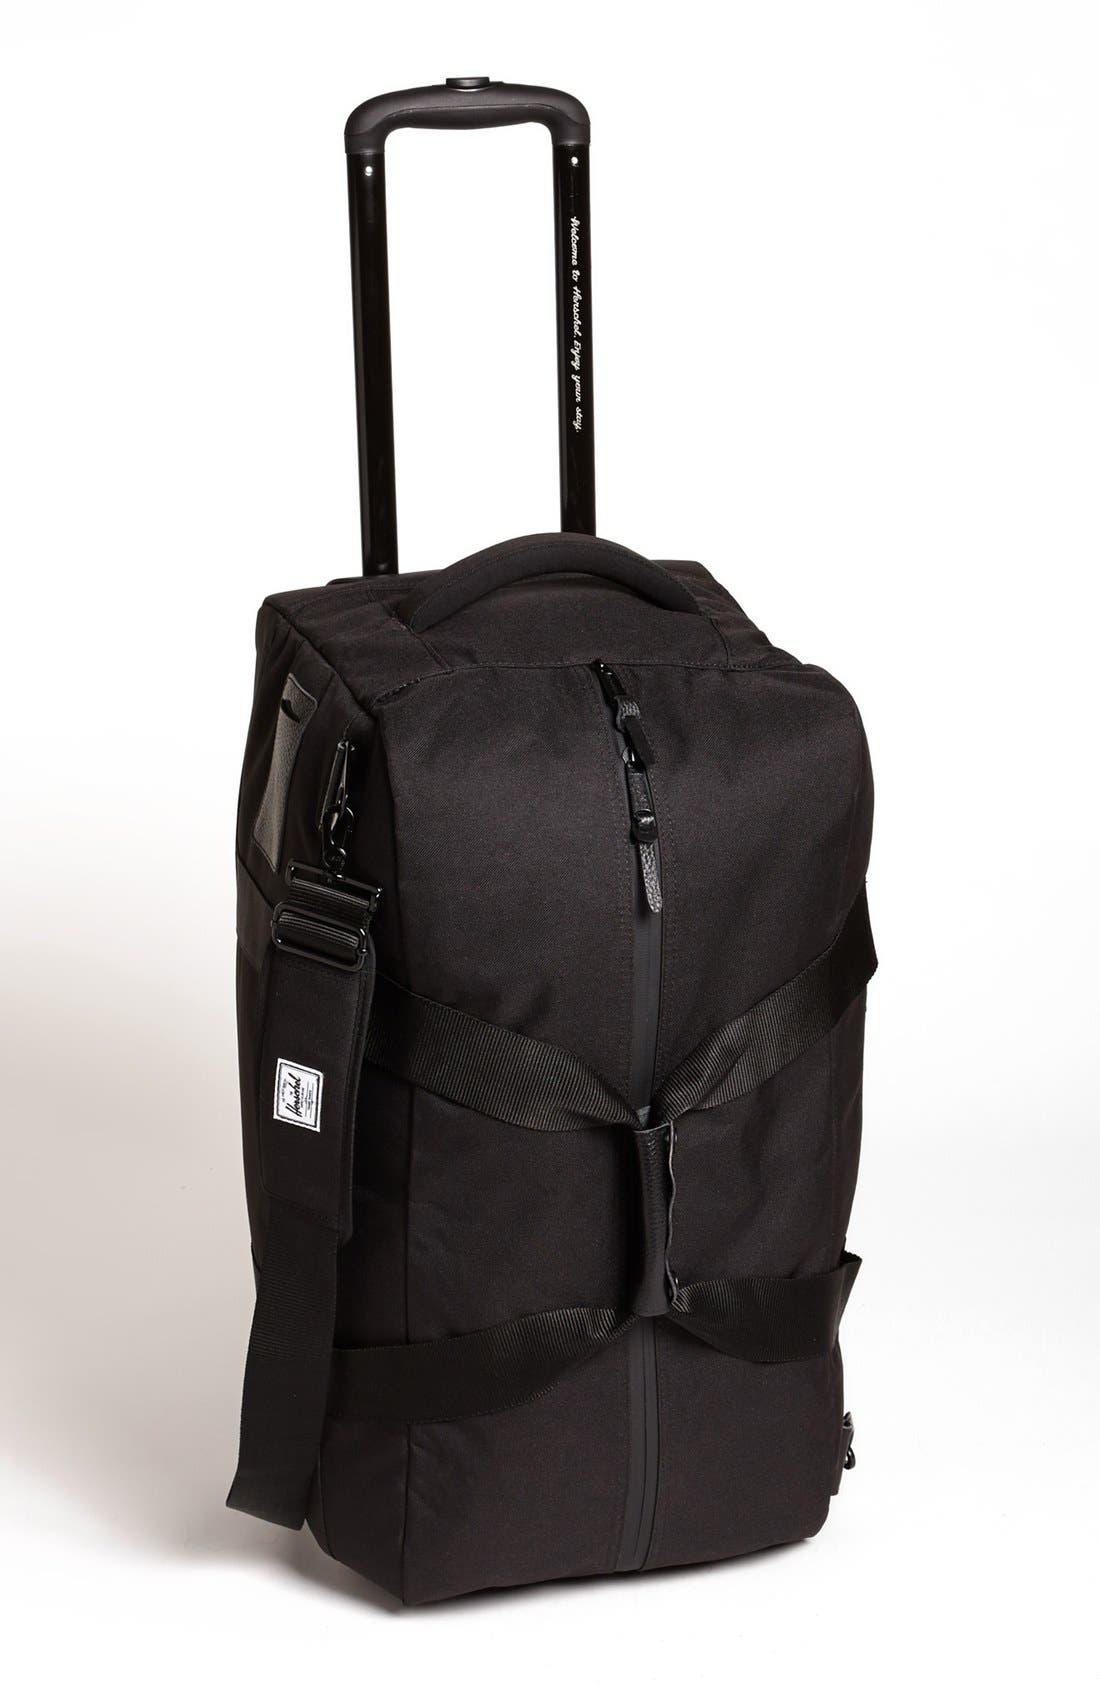 Main Image - Herschel Supply Co. 'Wheelie Outfitter' Travel Bag (24 Inch)